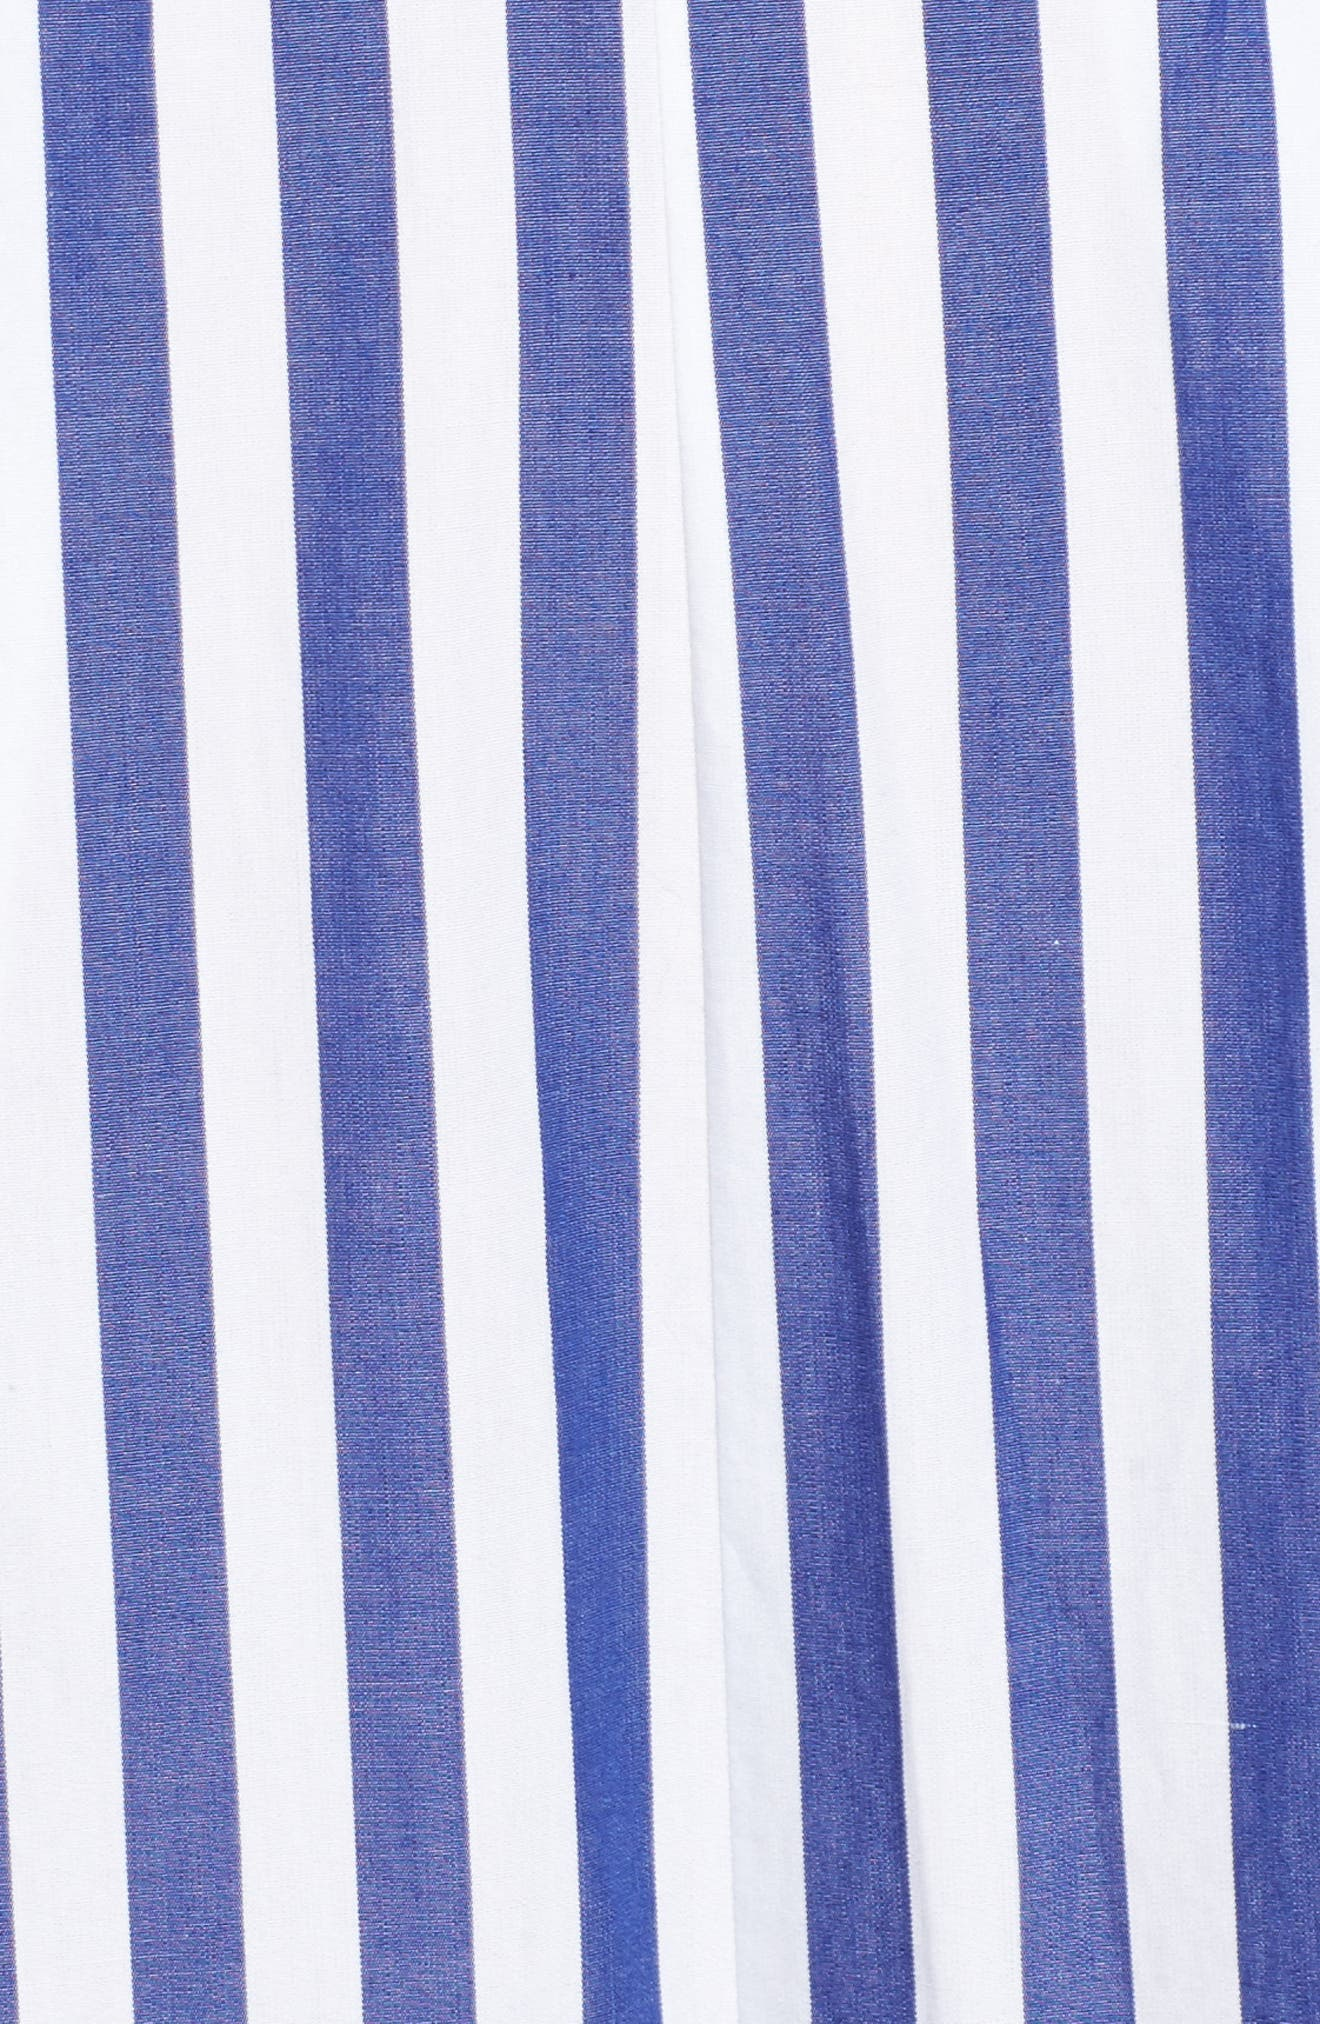 J.CREW, Stripe Halter Wide Leg Jumpsuit, Alternate thumbnail 6, color, TUSHAR STRIPE LIGHTHOUSE